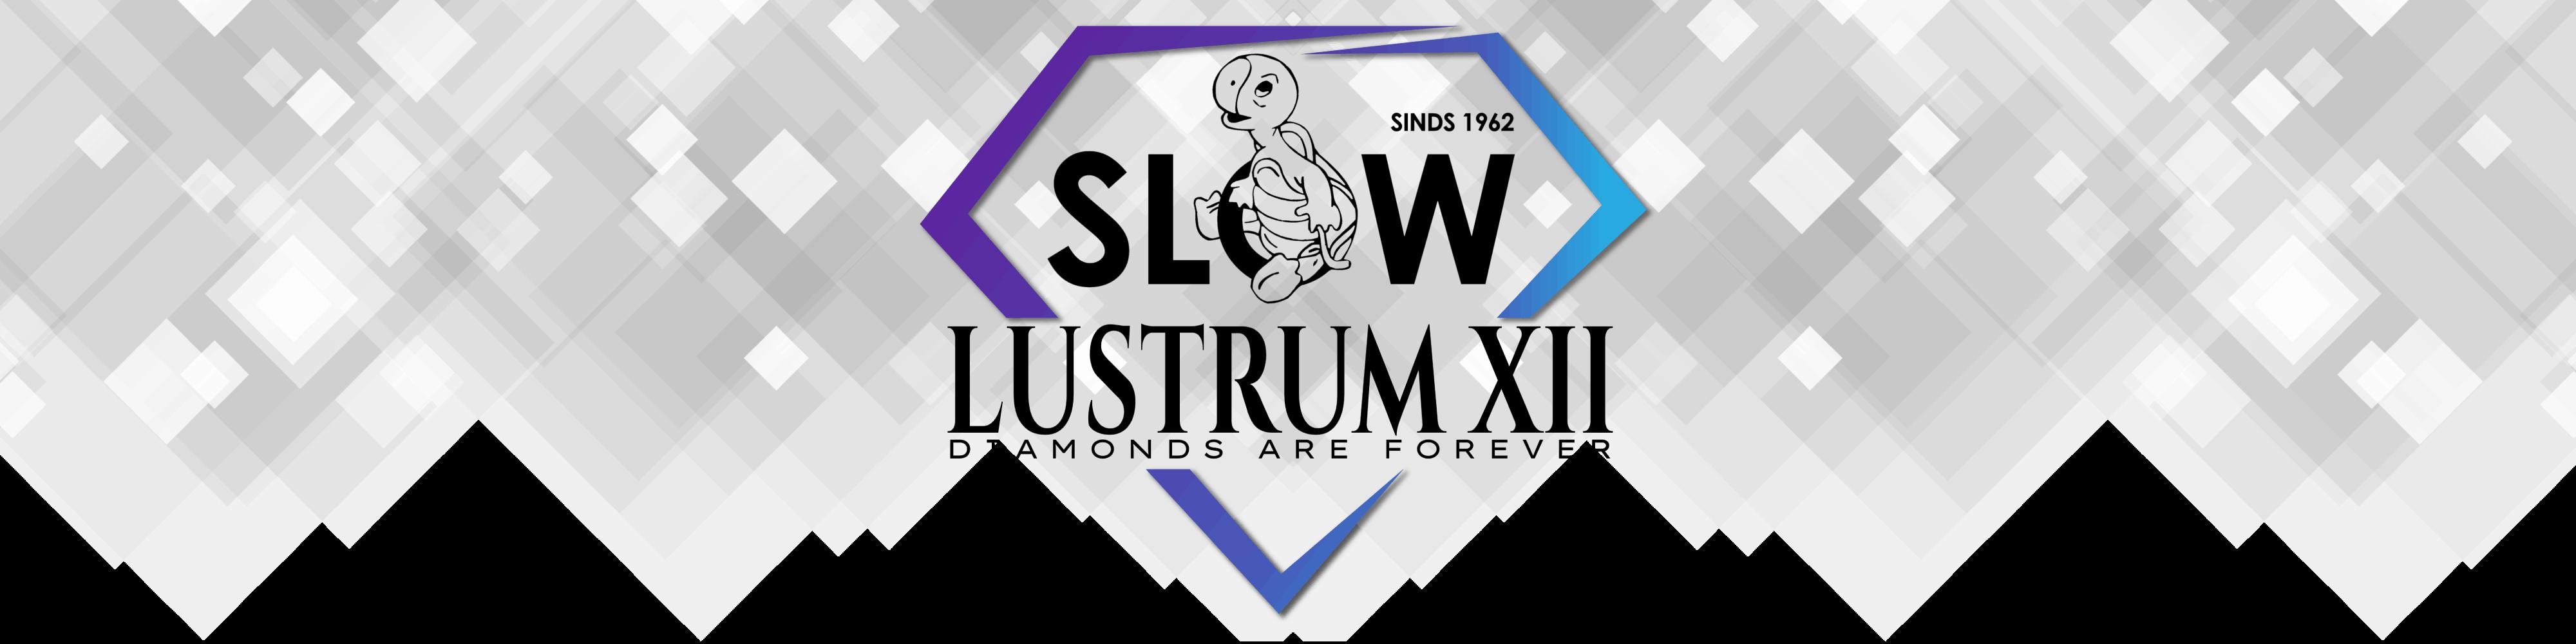 lustrum_banner_site_wide